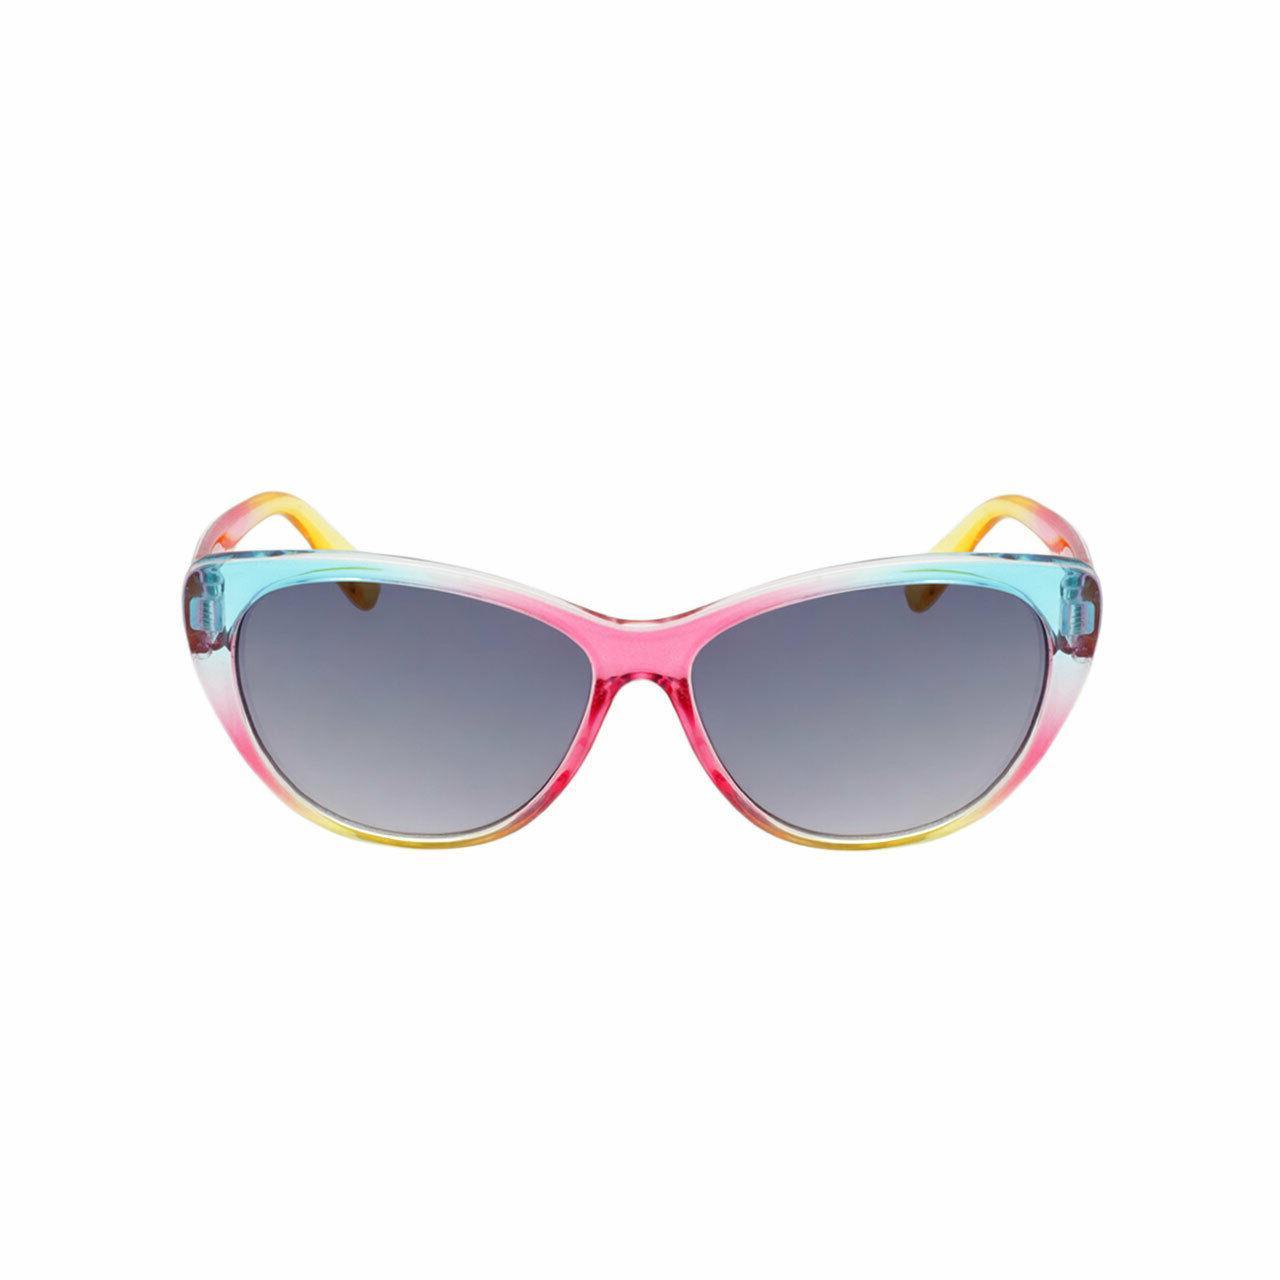 Girls Sunglasses 12 Girls UNICORNS Child Size